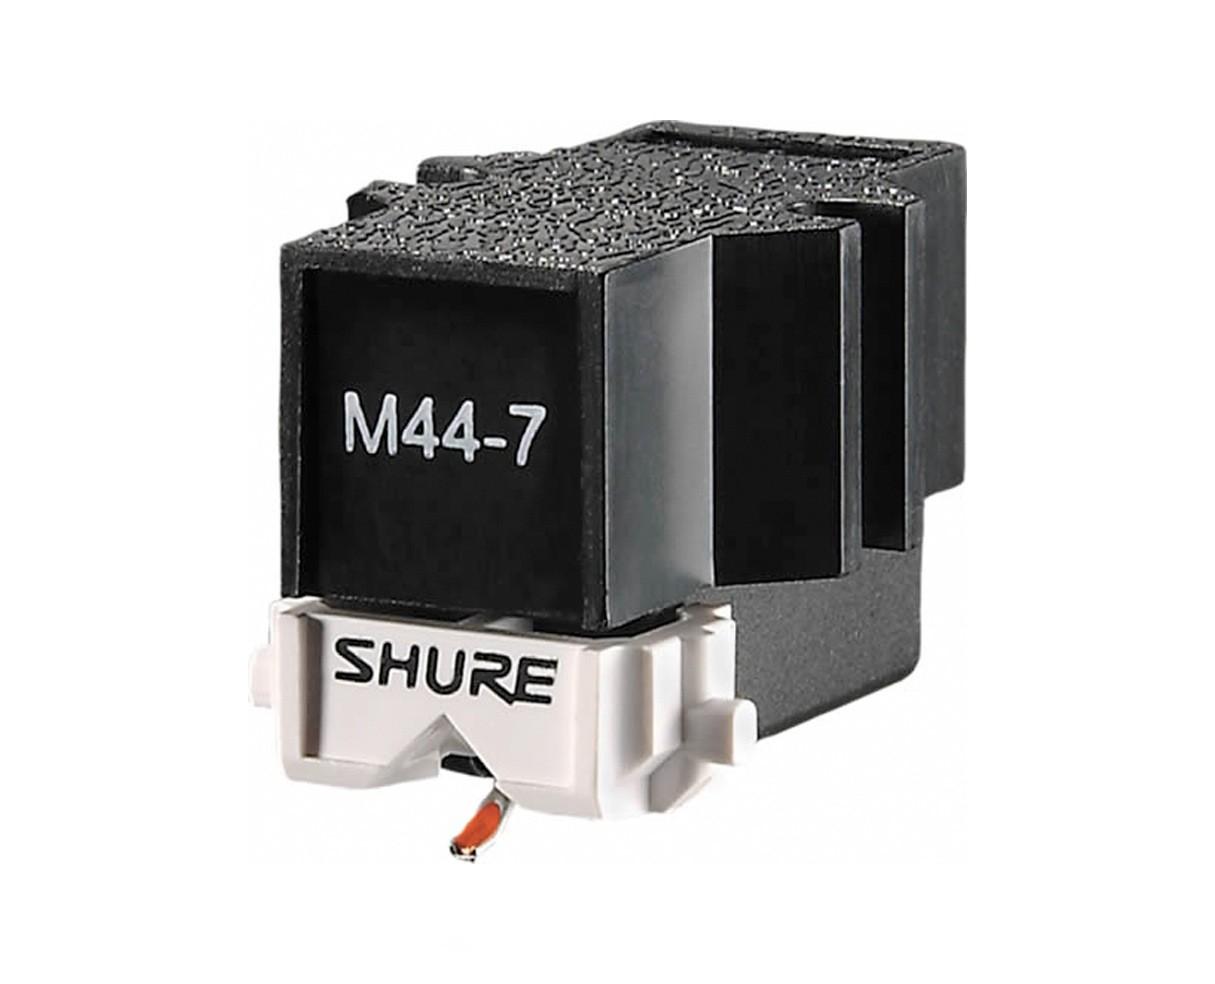 Головки звукоснимателя Shure M44-7